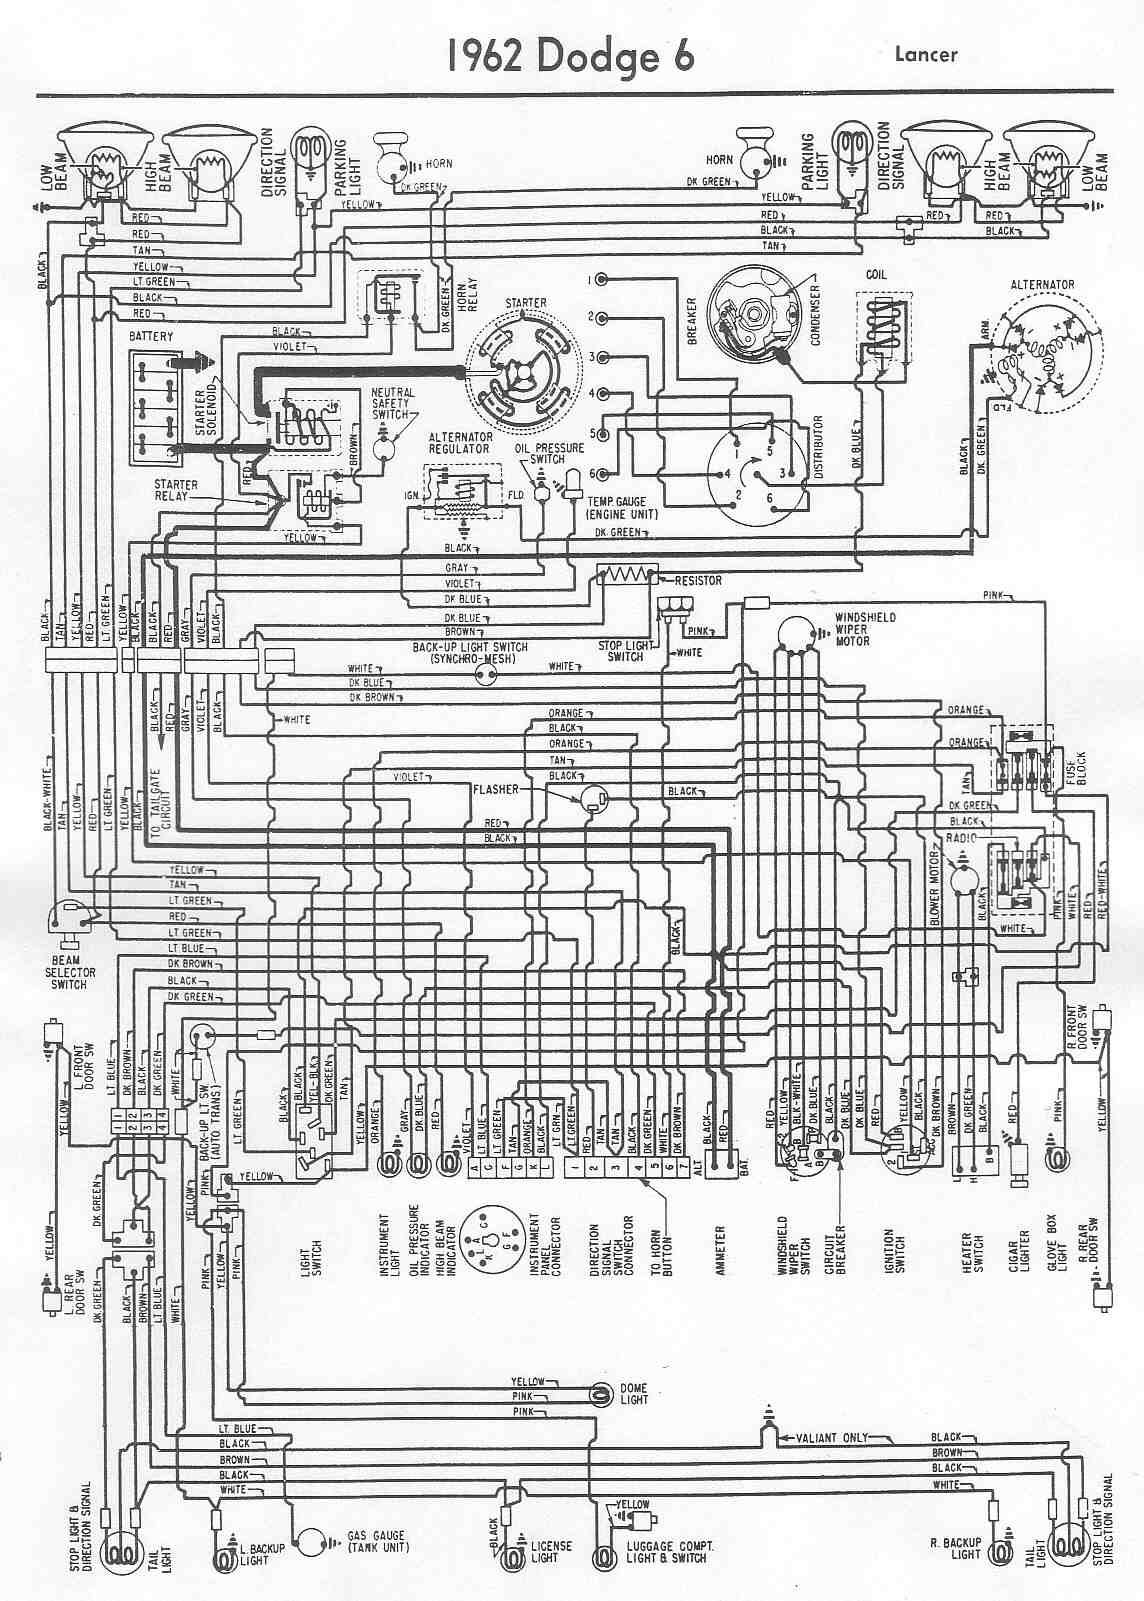 Dodge Meadowbrook Wiring - Electrical Work Wiring Diagram •